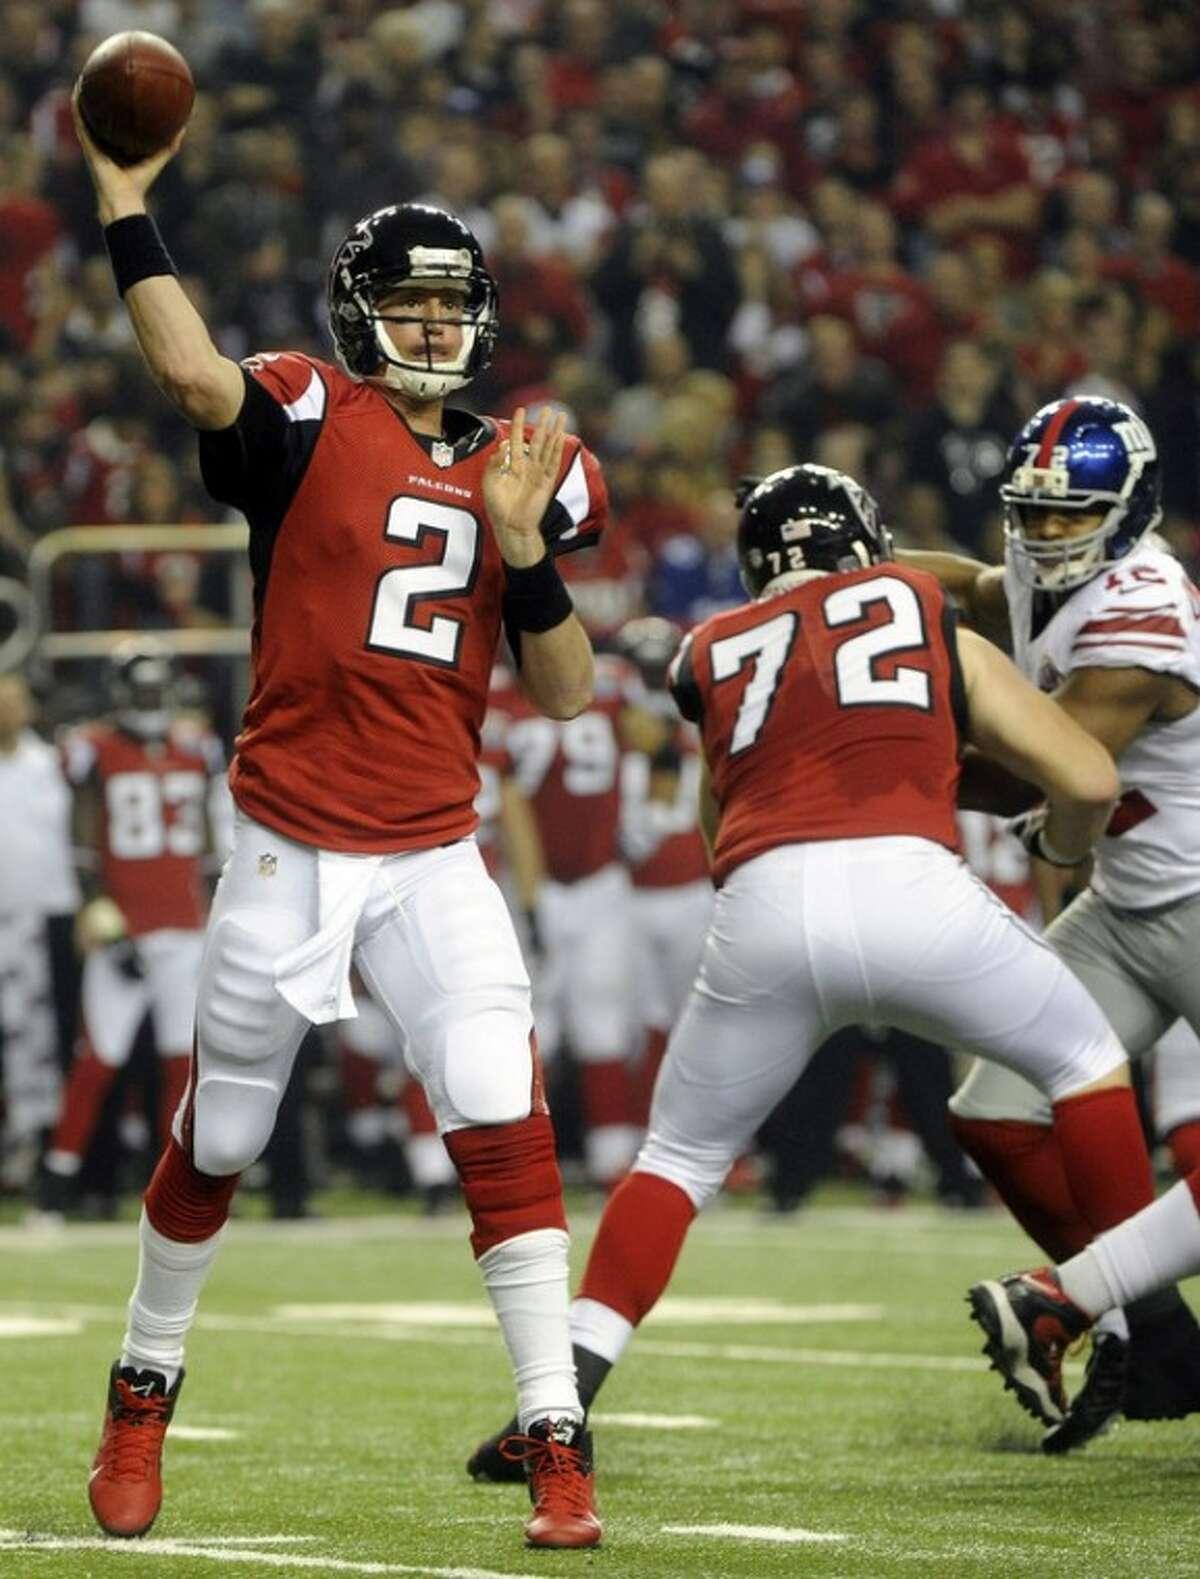 Atlanta Falcons quarterback Matt Ryan (2) works against the New York Giants during the first half of an NFL football game on Sunday, Dec. 16, 2012, in Atlanta. (AP Photo/John Amis)